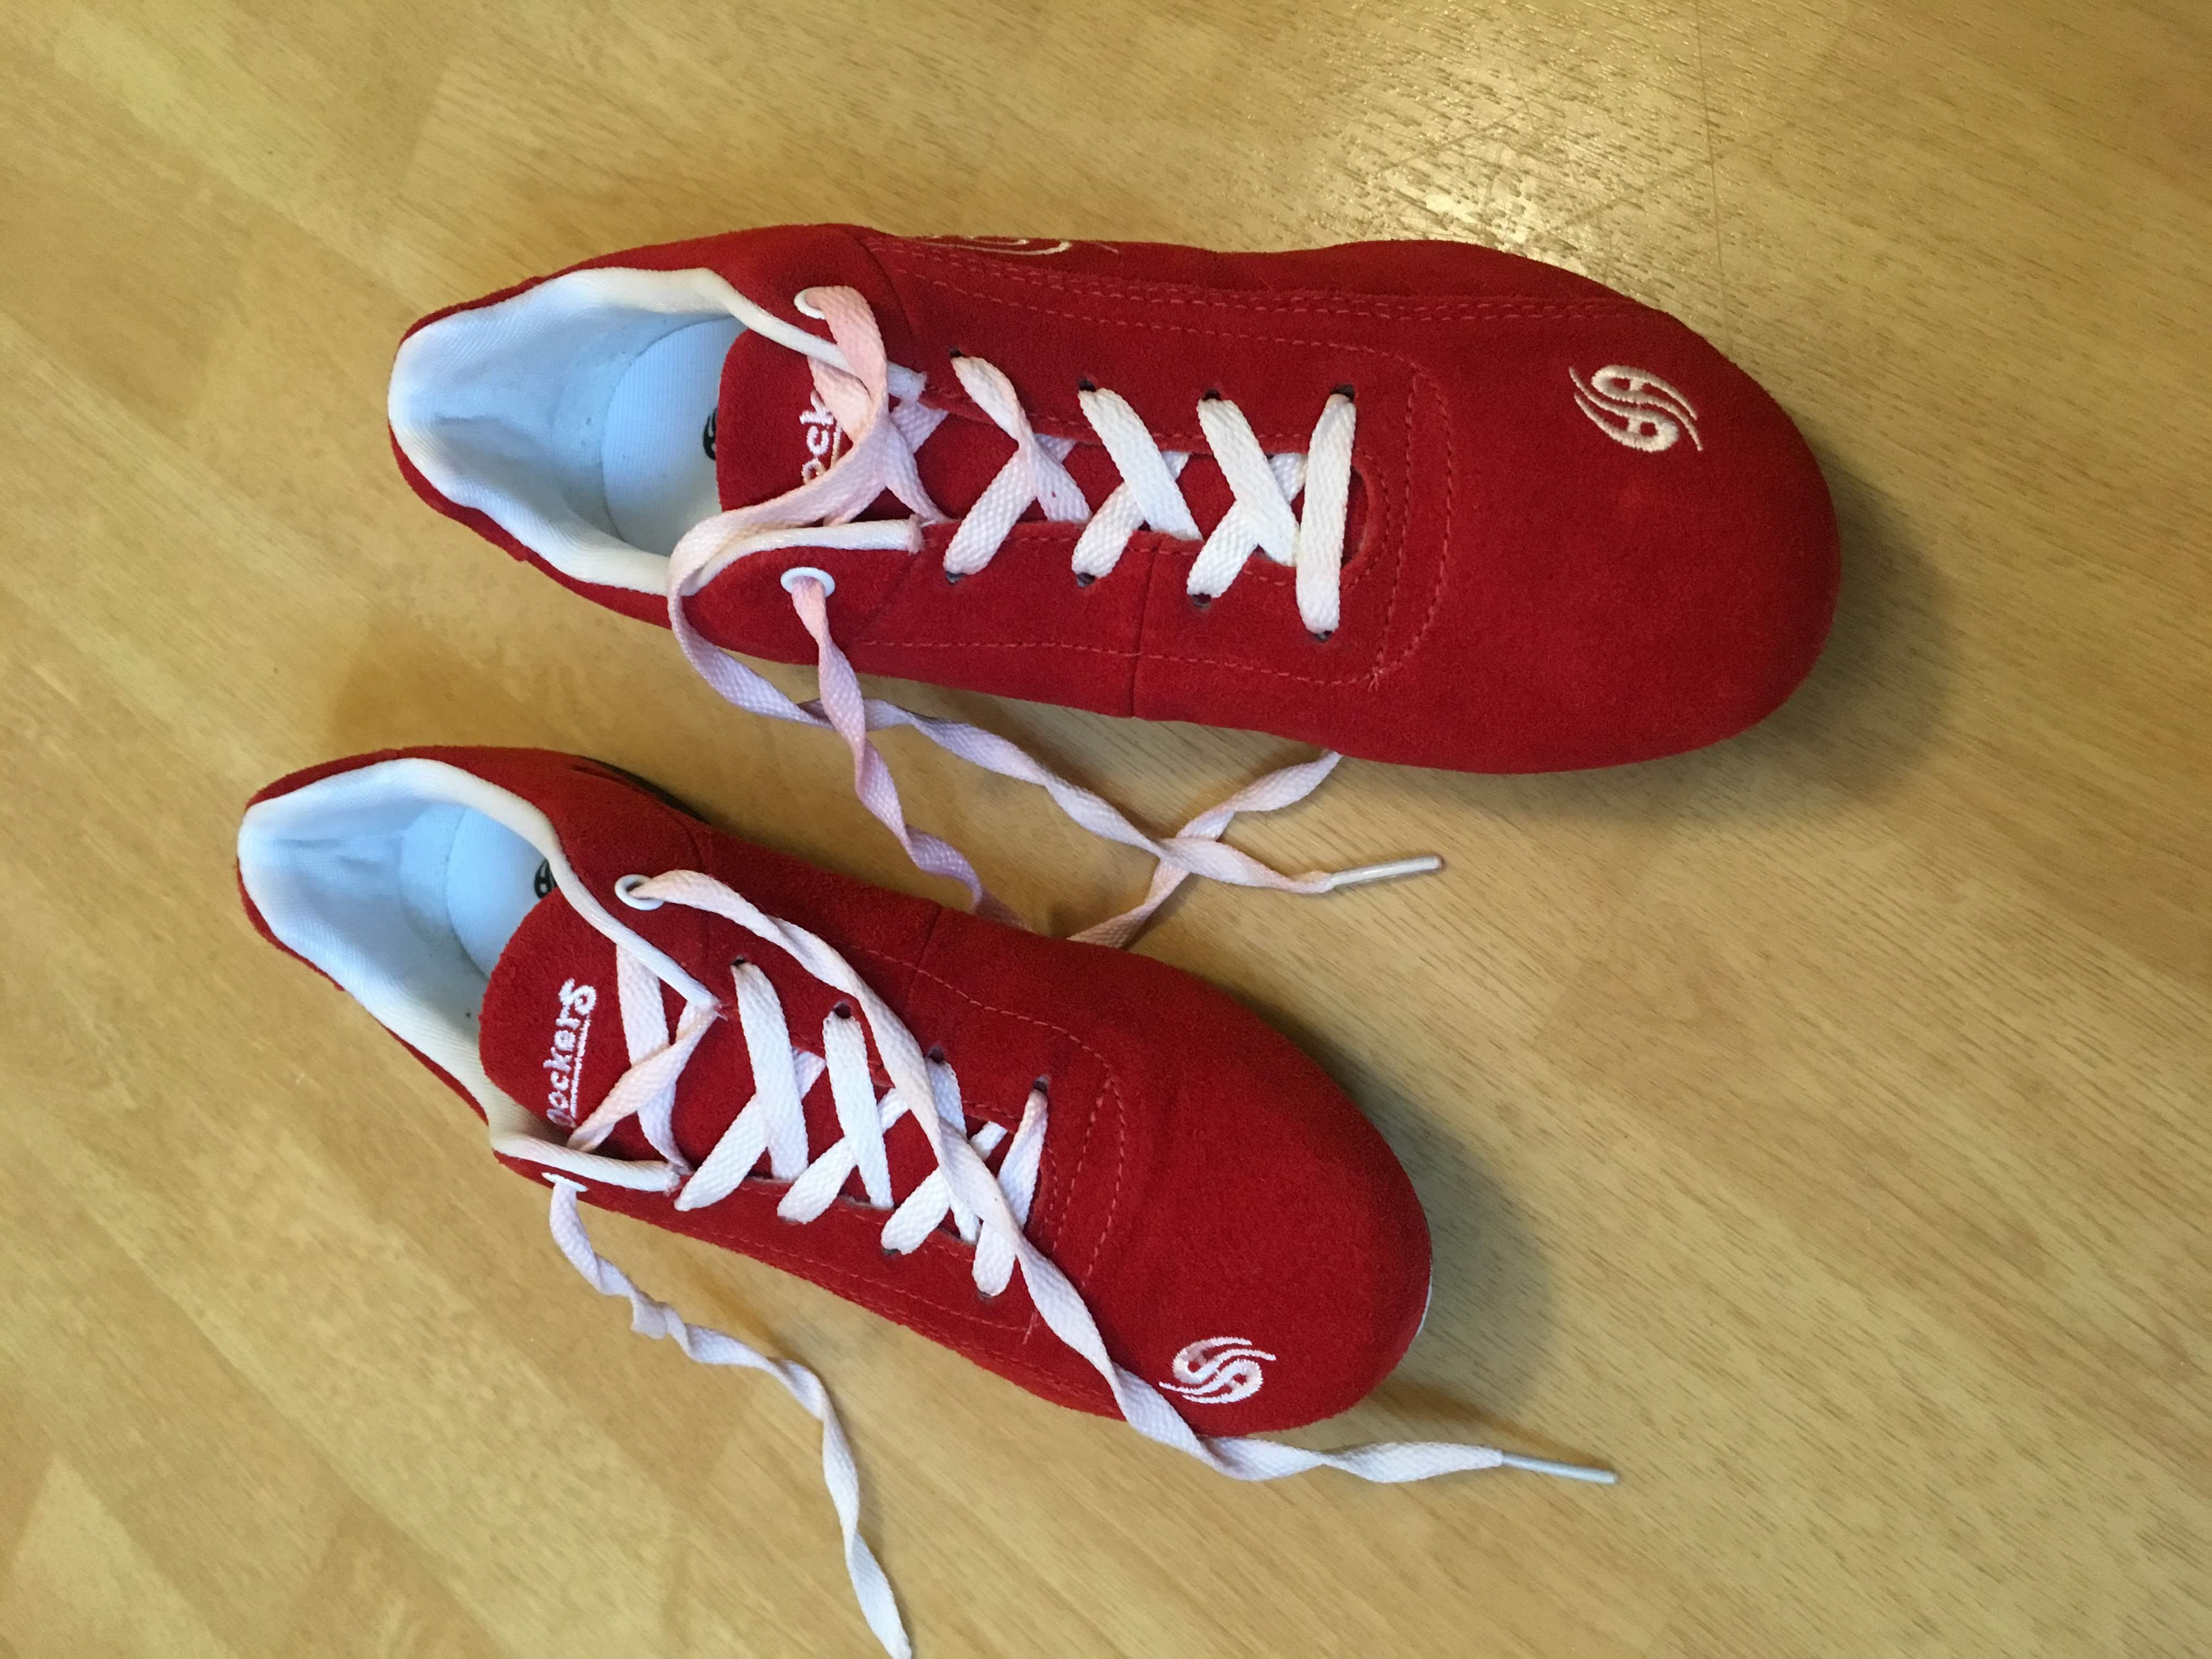 Sneakers, Marke Dockers, rot mit weiß, links 37/38, rechts36/ 37